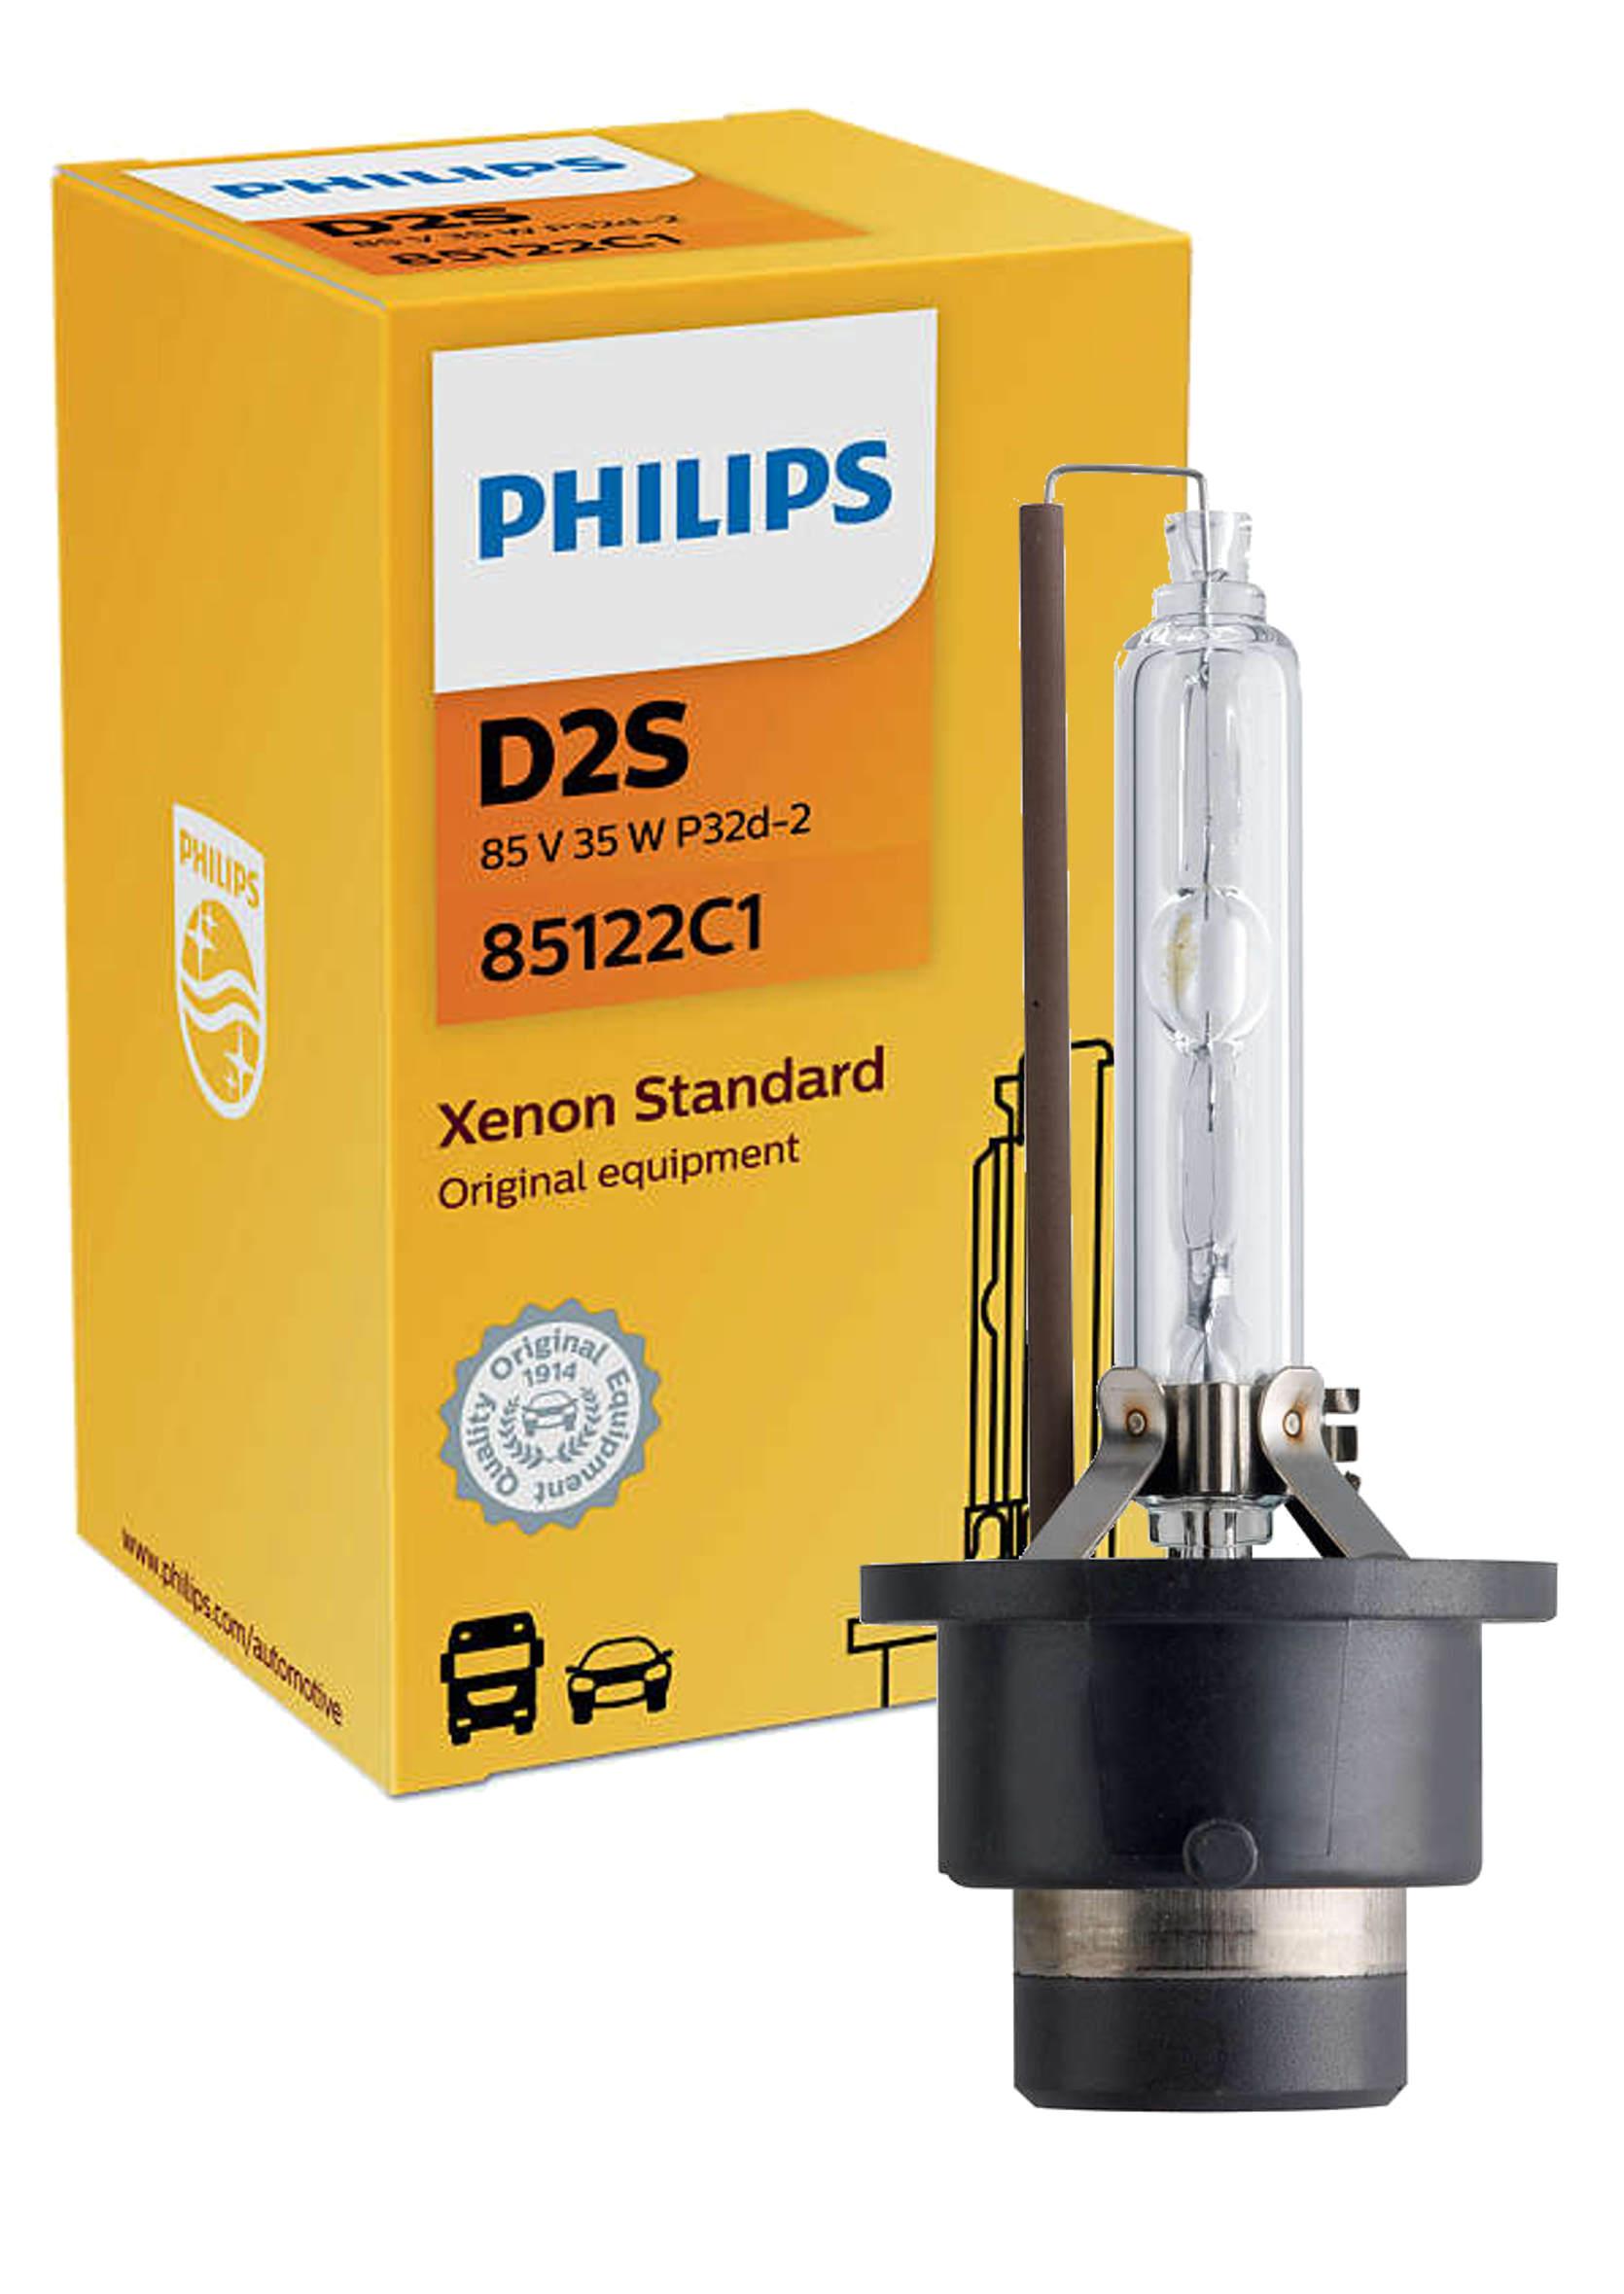 Philips Xenon Vision D2S 4300K 85V 35W P32d-2 Żarnik Ksenonowy 1szt.